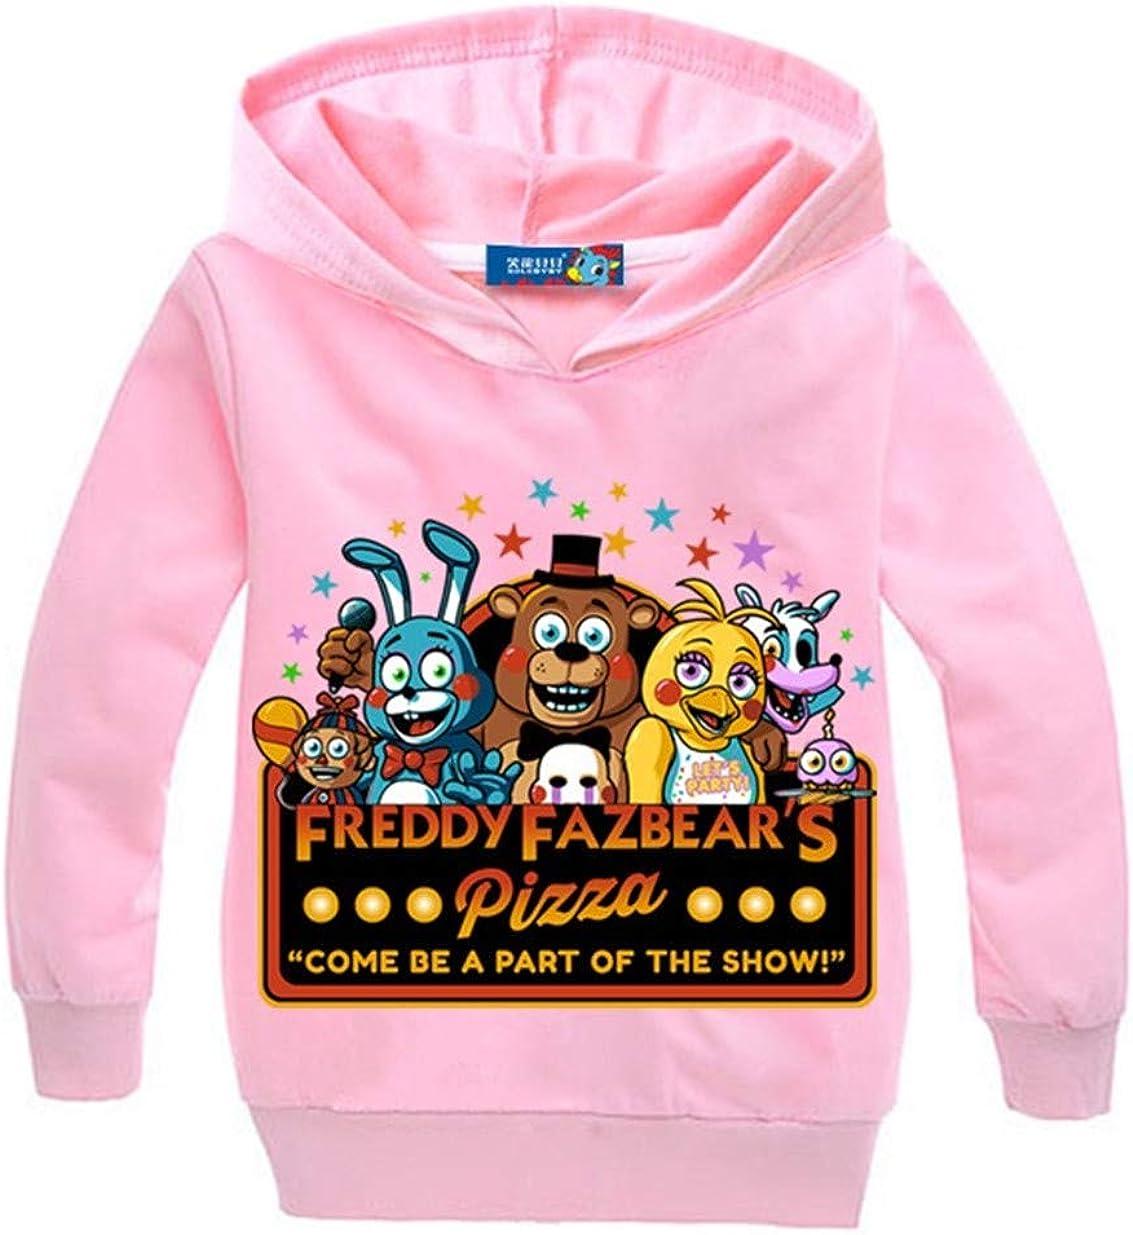 XMTIHE Kid Boy Girl Five Nights at Freddy's Long Sleeve Hoodies Sweatshirt-Cartoon Pullover Hooded Tops